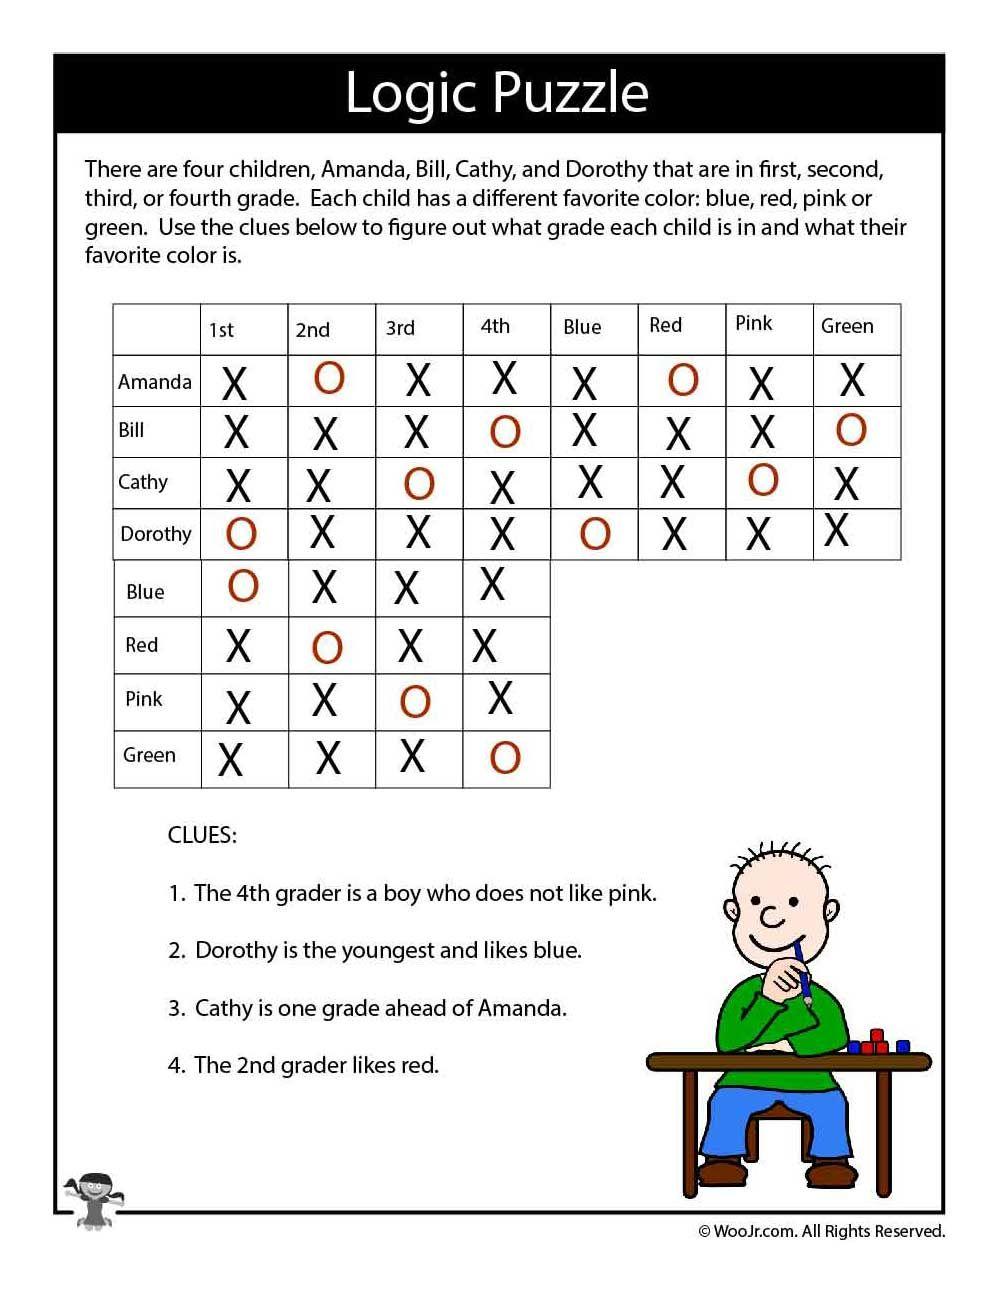 Hard Logic Puzzle for Kids ANSWERS Logic puzzles